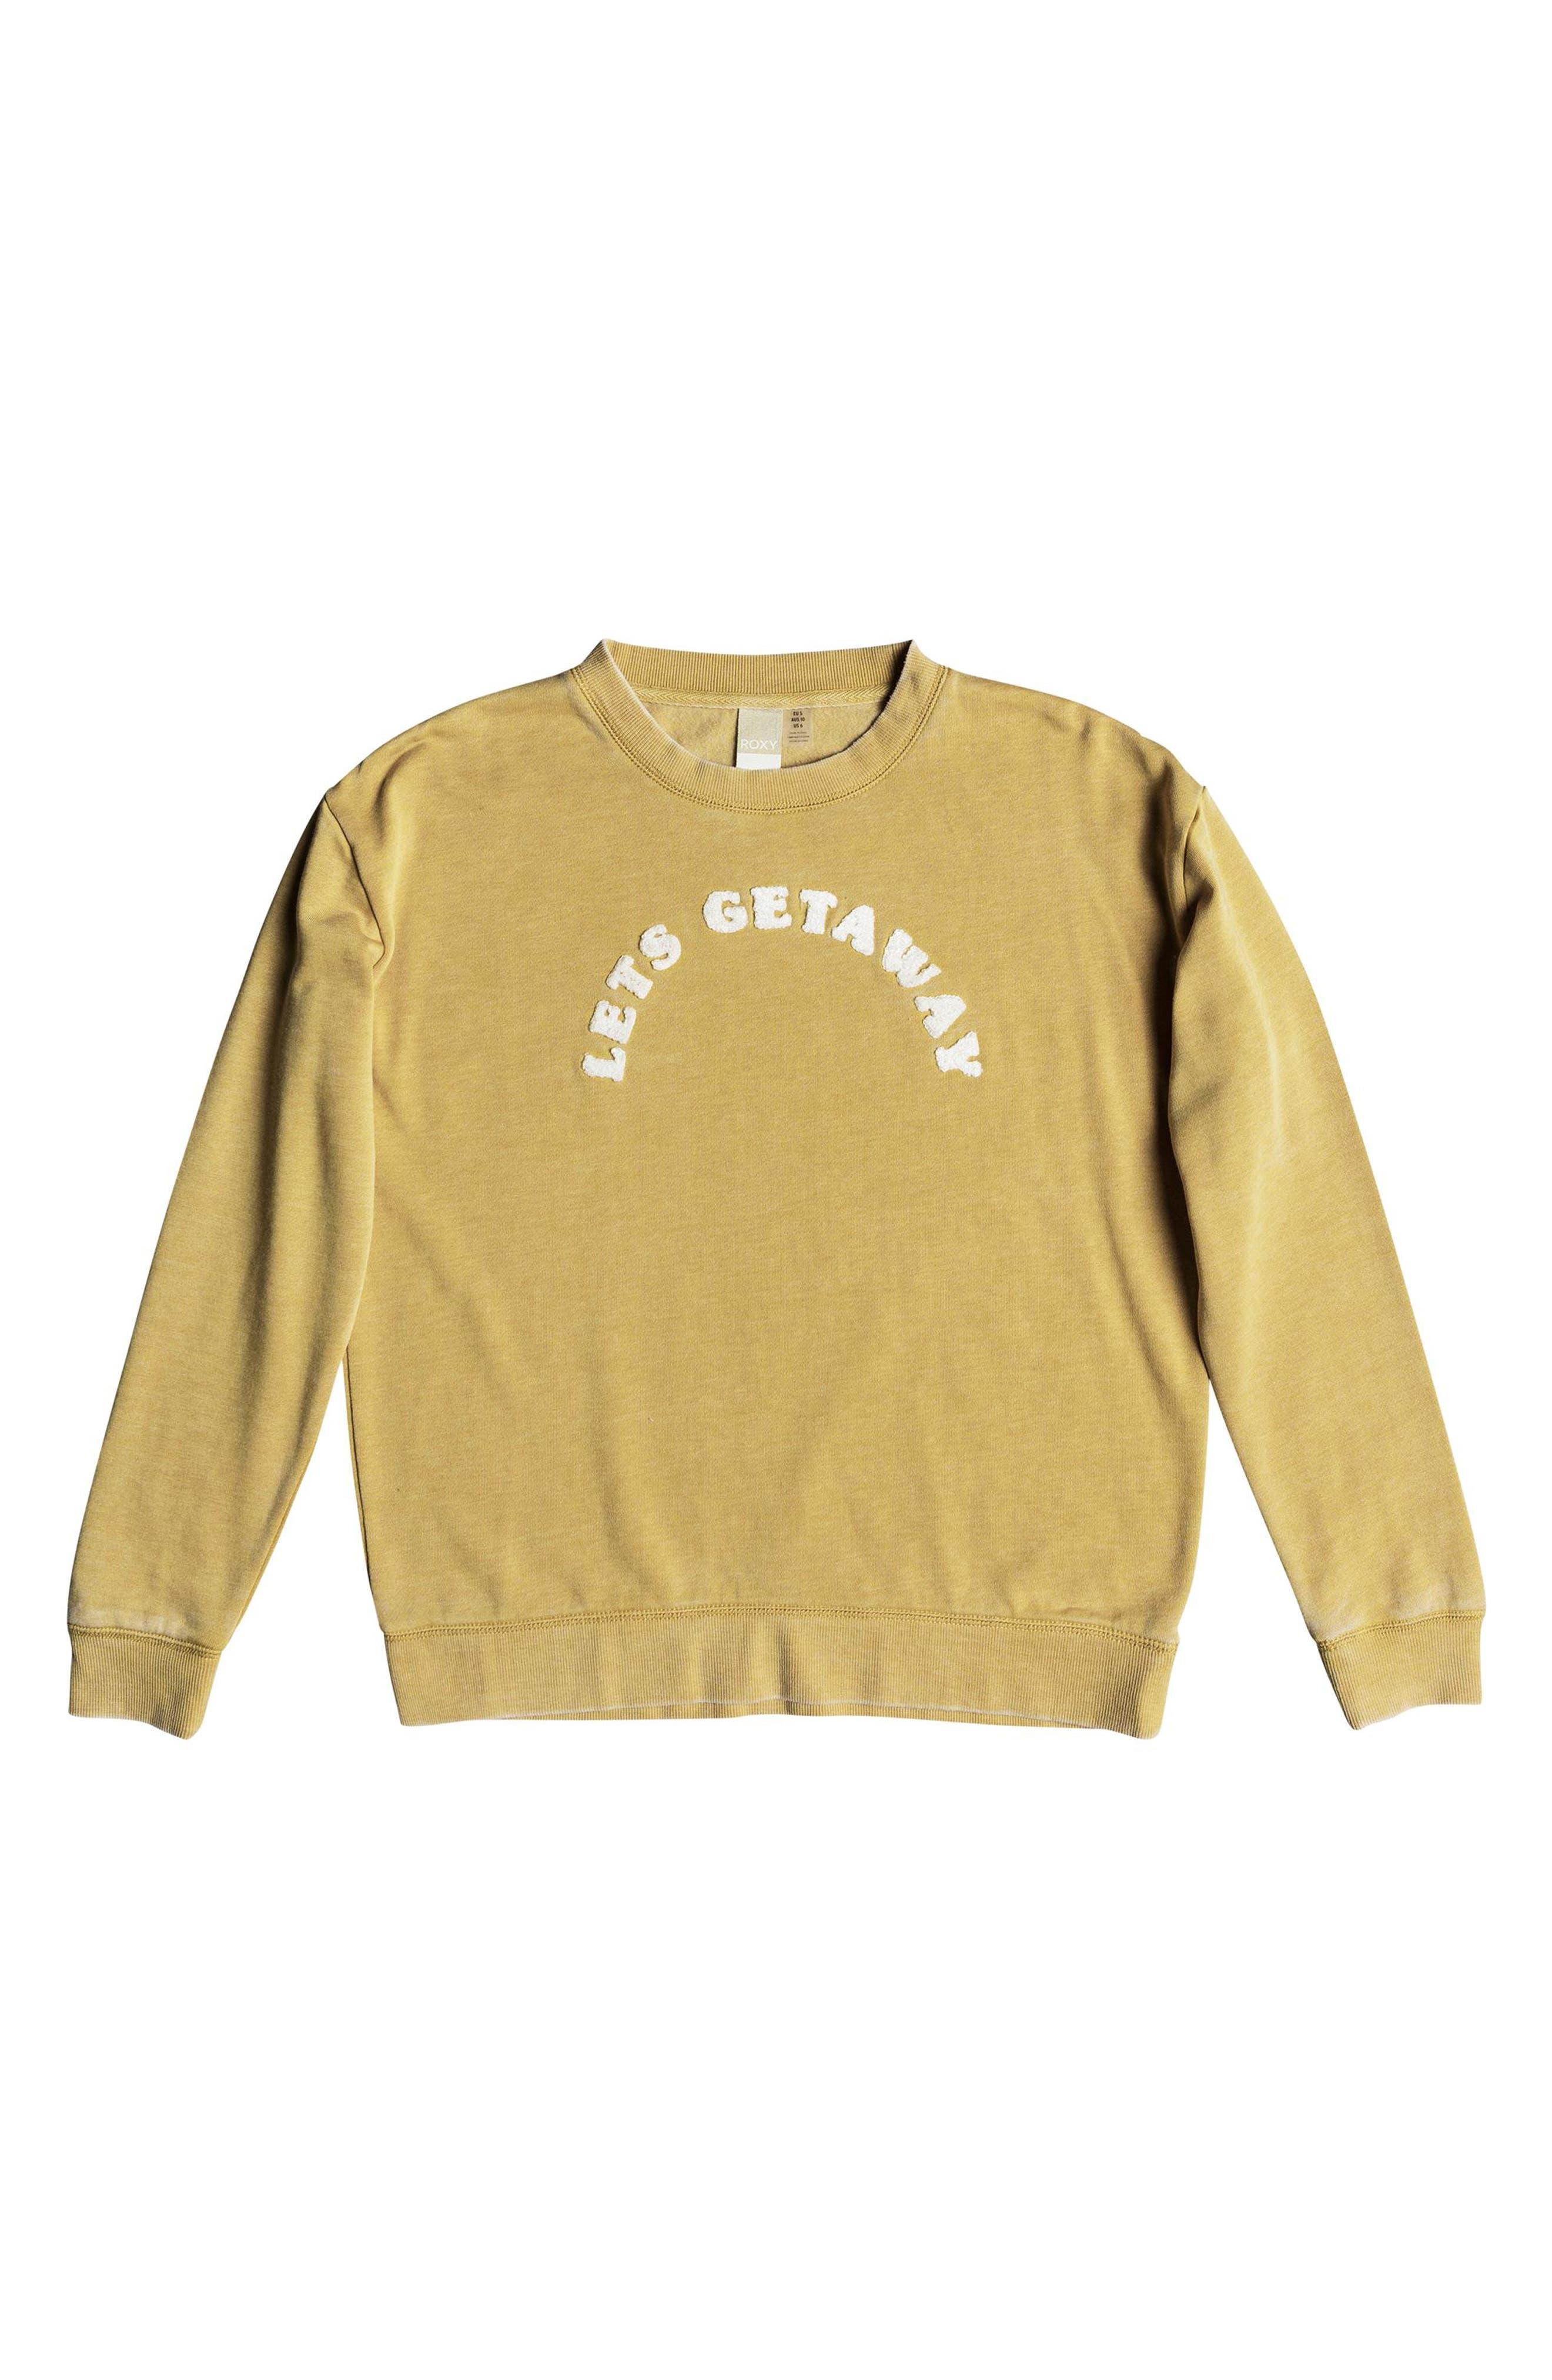 All At Sea Sweatshirt,                             Alternate thumbnail 3, color,                             FALL LEAF